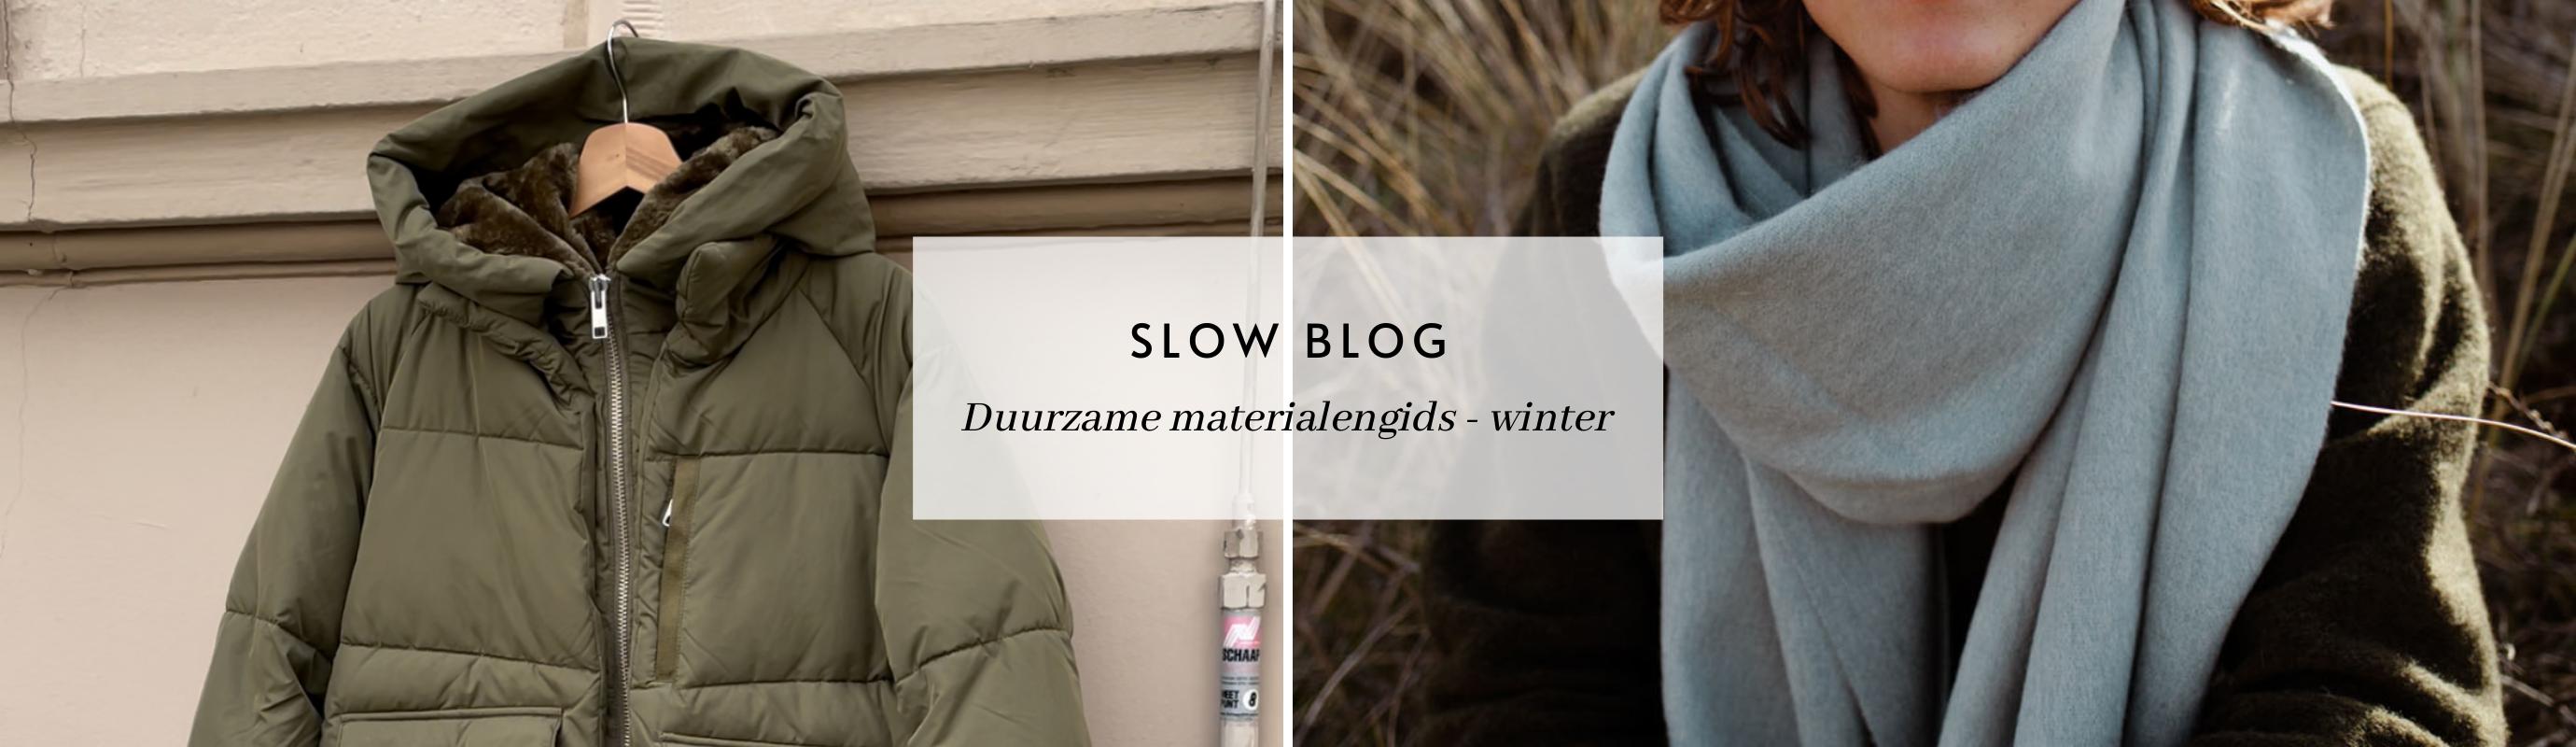 Duurzame materialengids - winter